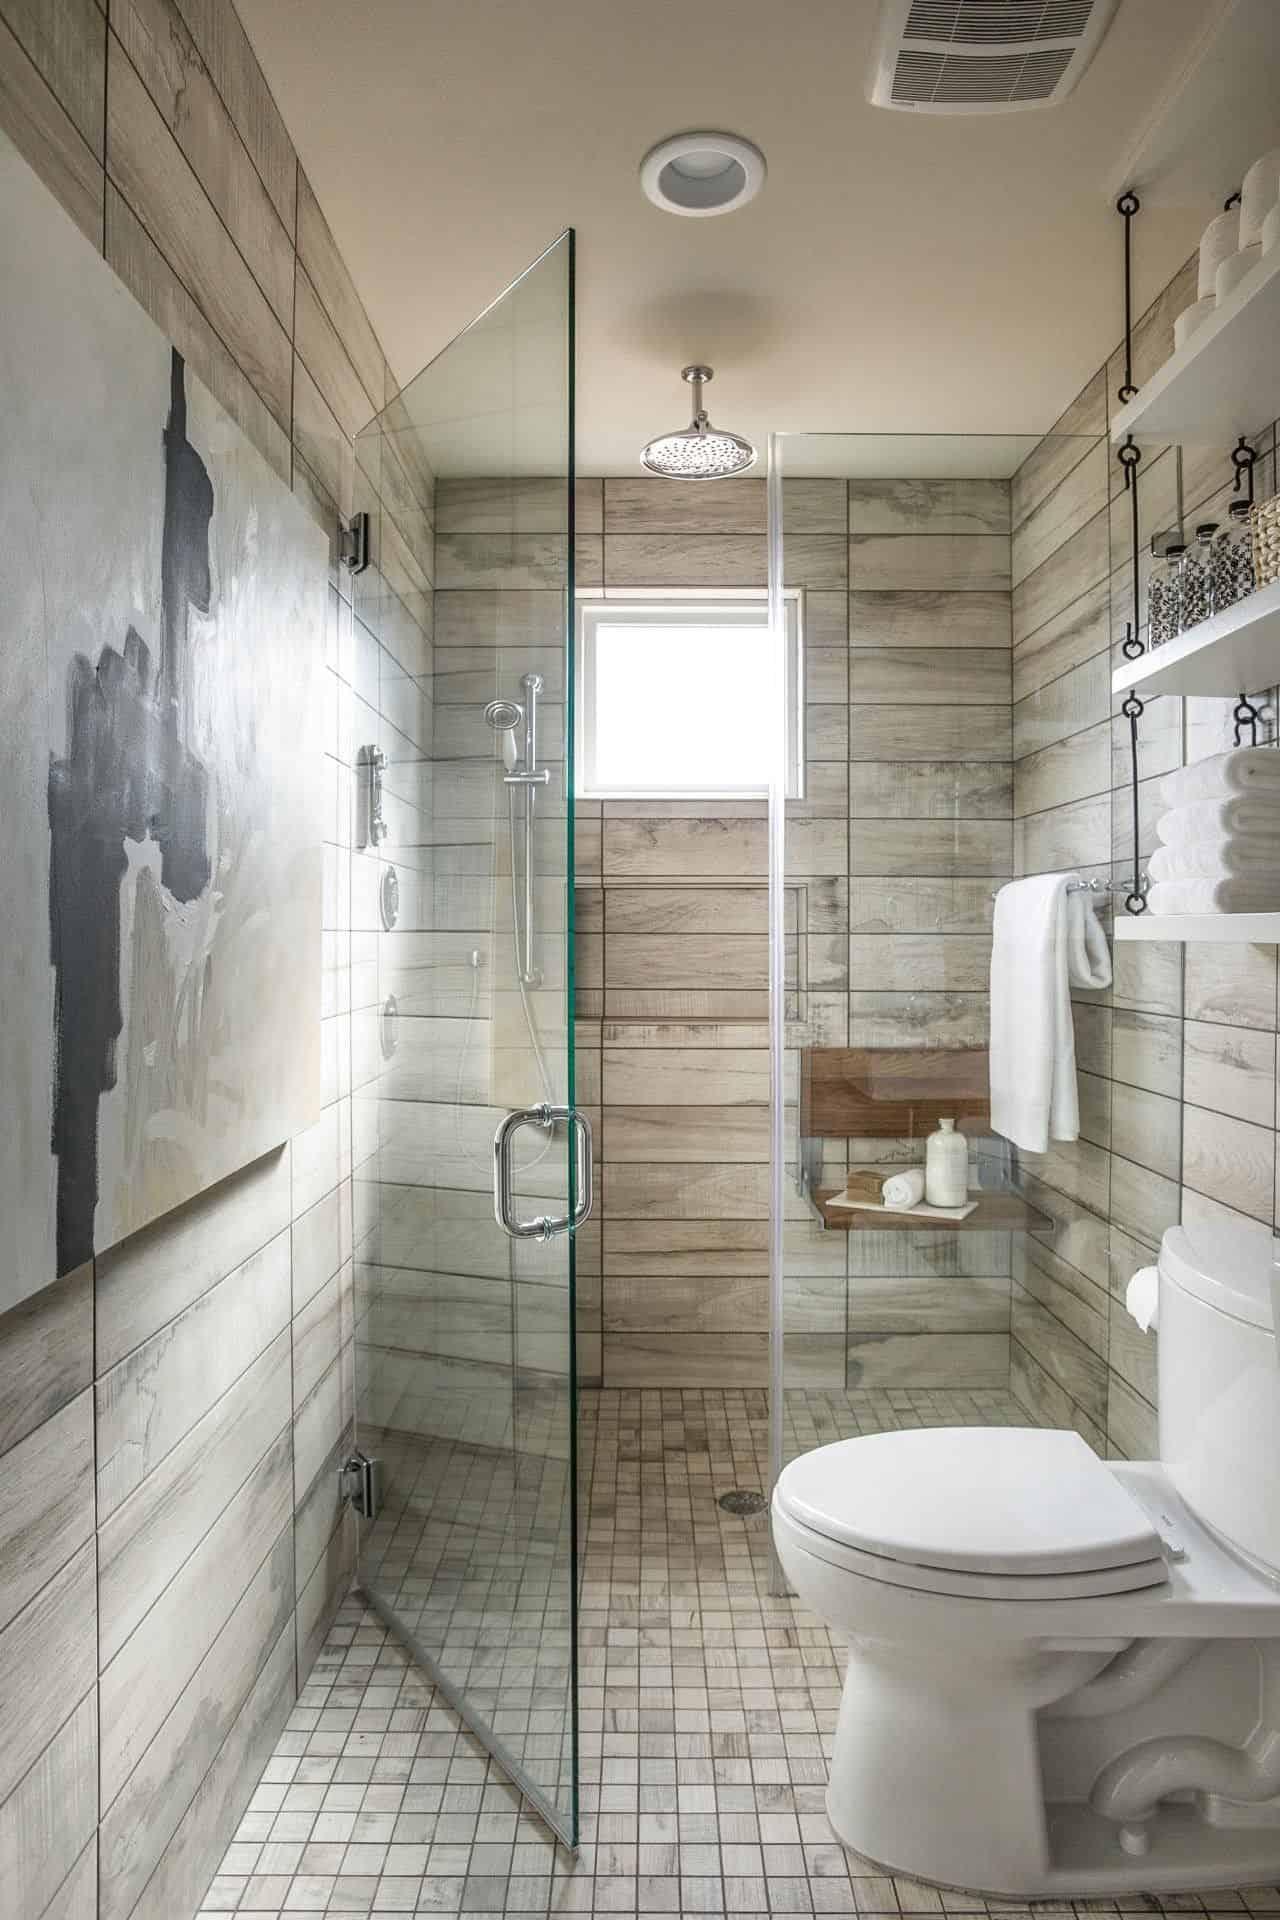 designing small bathrooms Unique Bathroom Hgtv Bathroom Designs Small Bathrooms Good Home Design